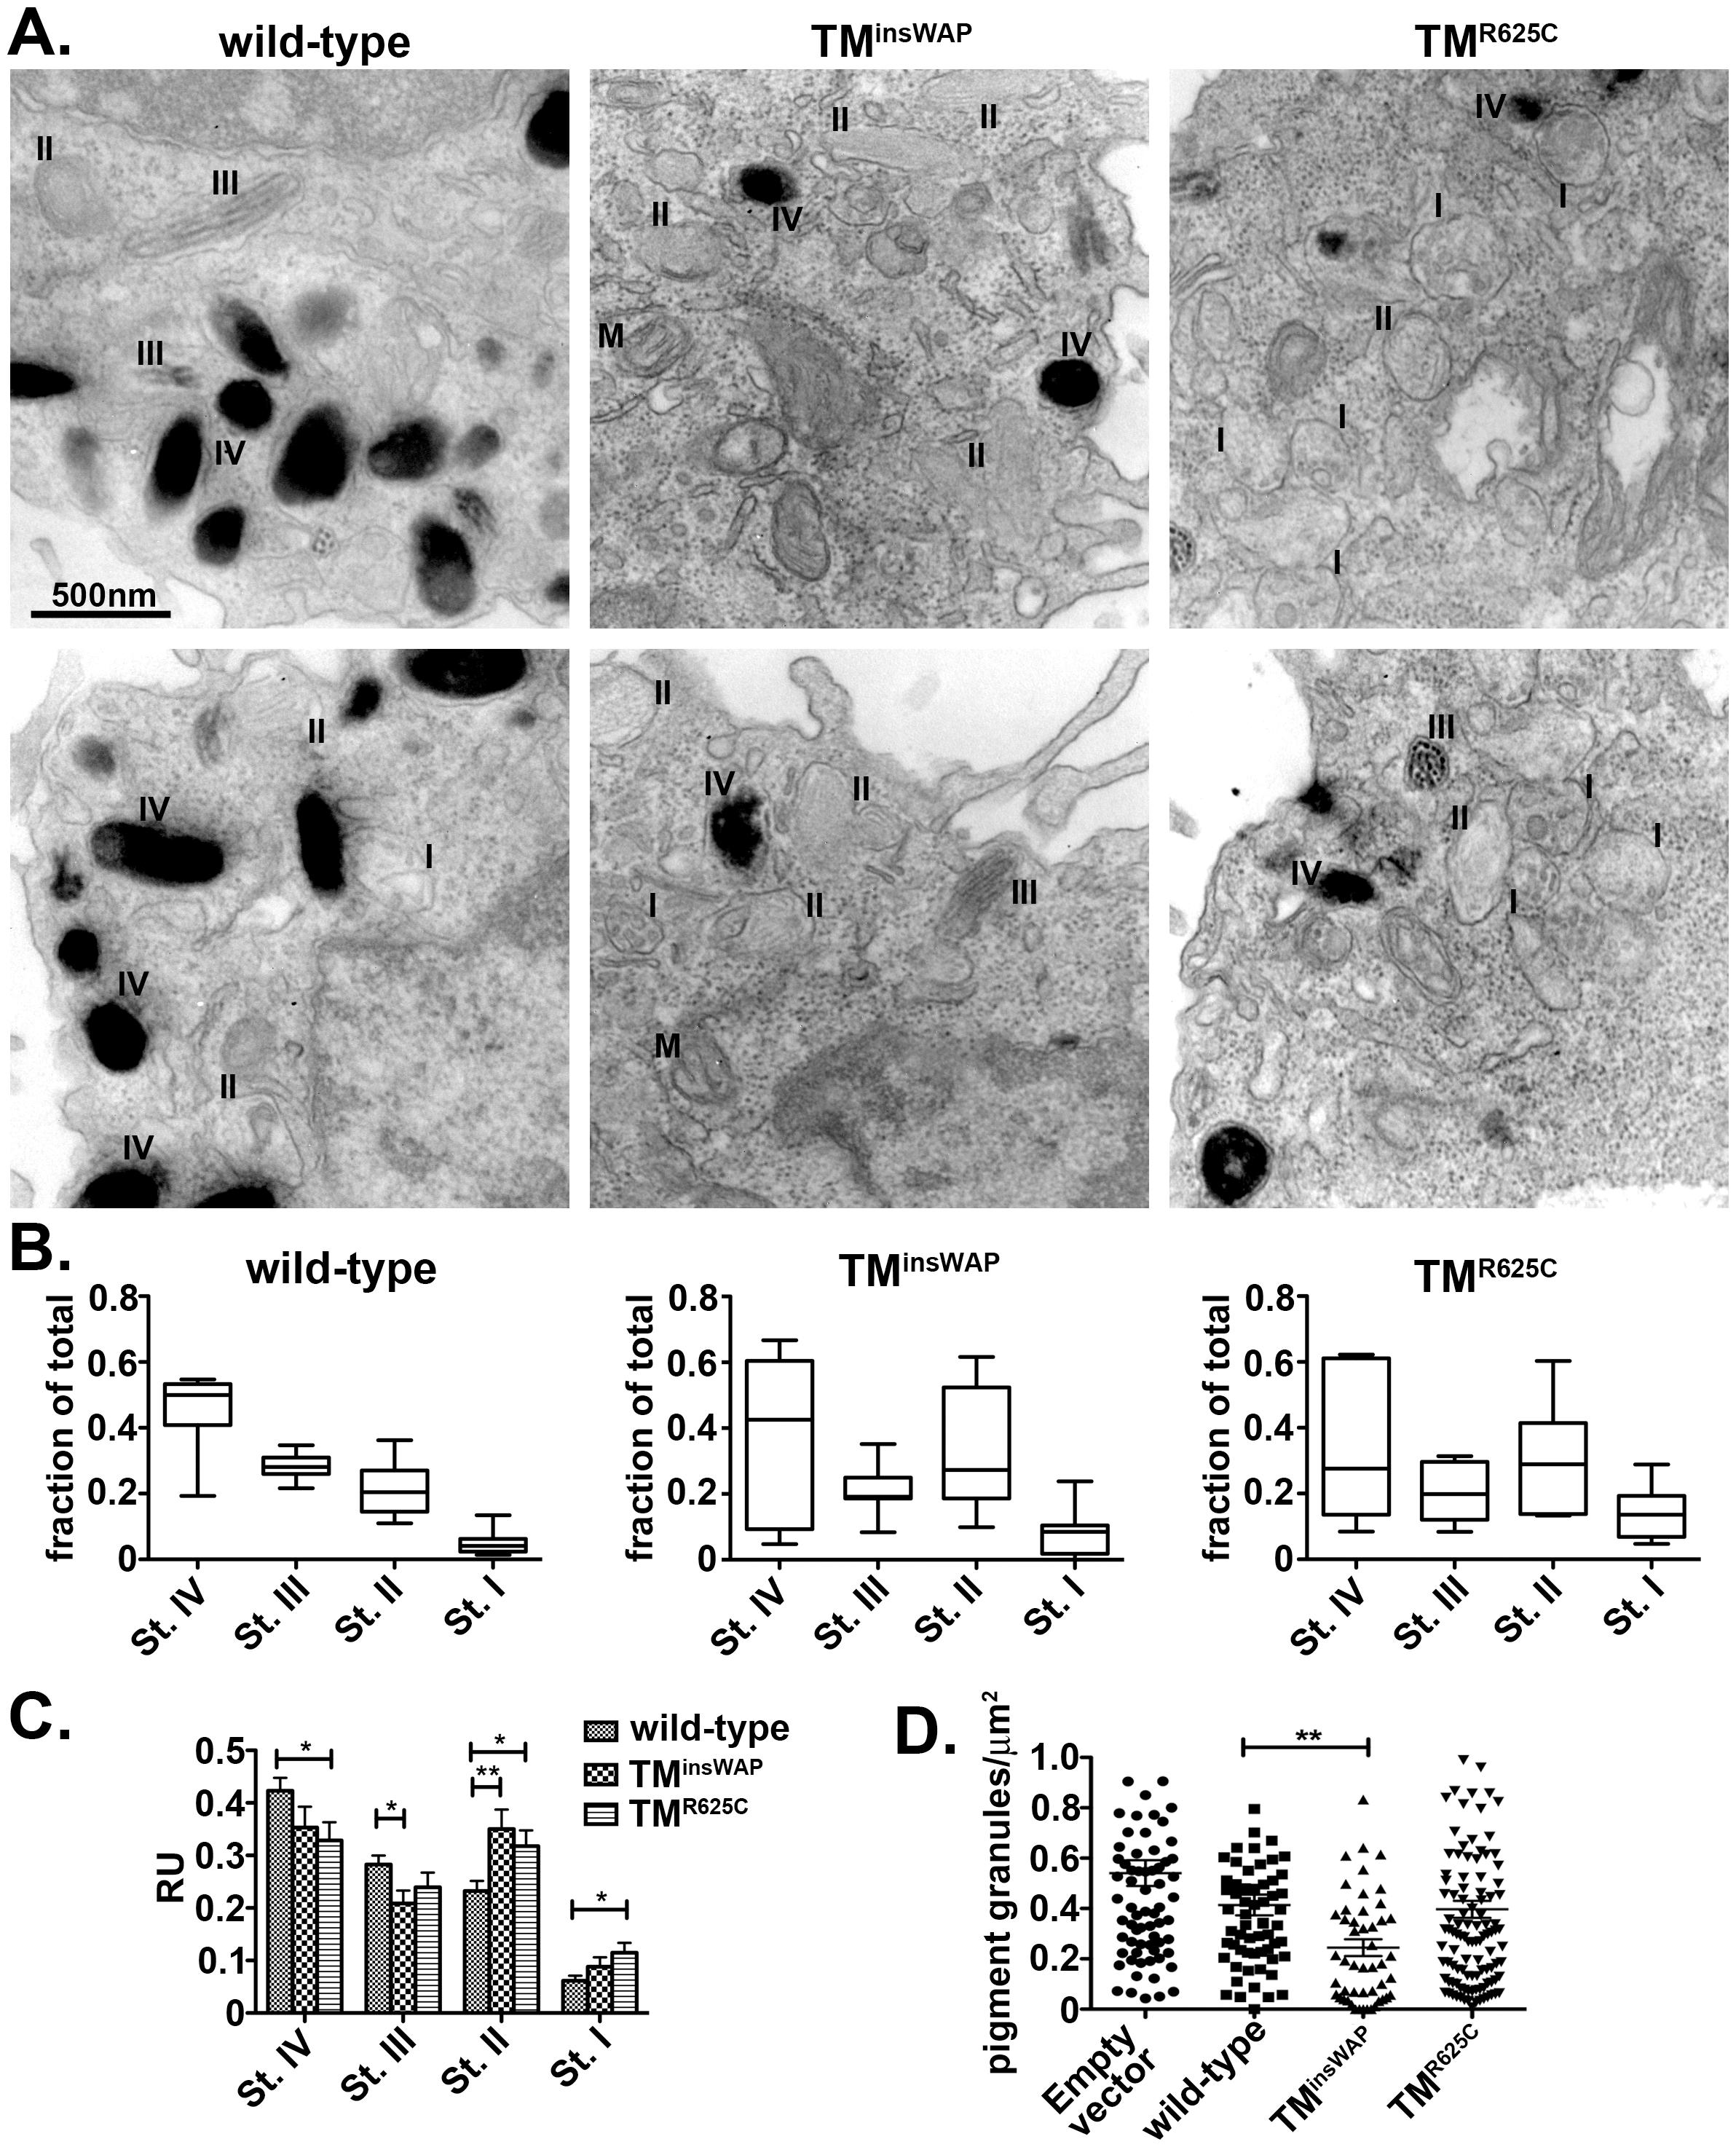 Reduced melanosome pigmentation in melanocytes expressing PMEL TMD mutants.